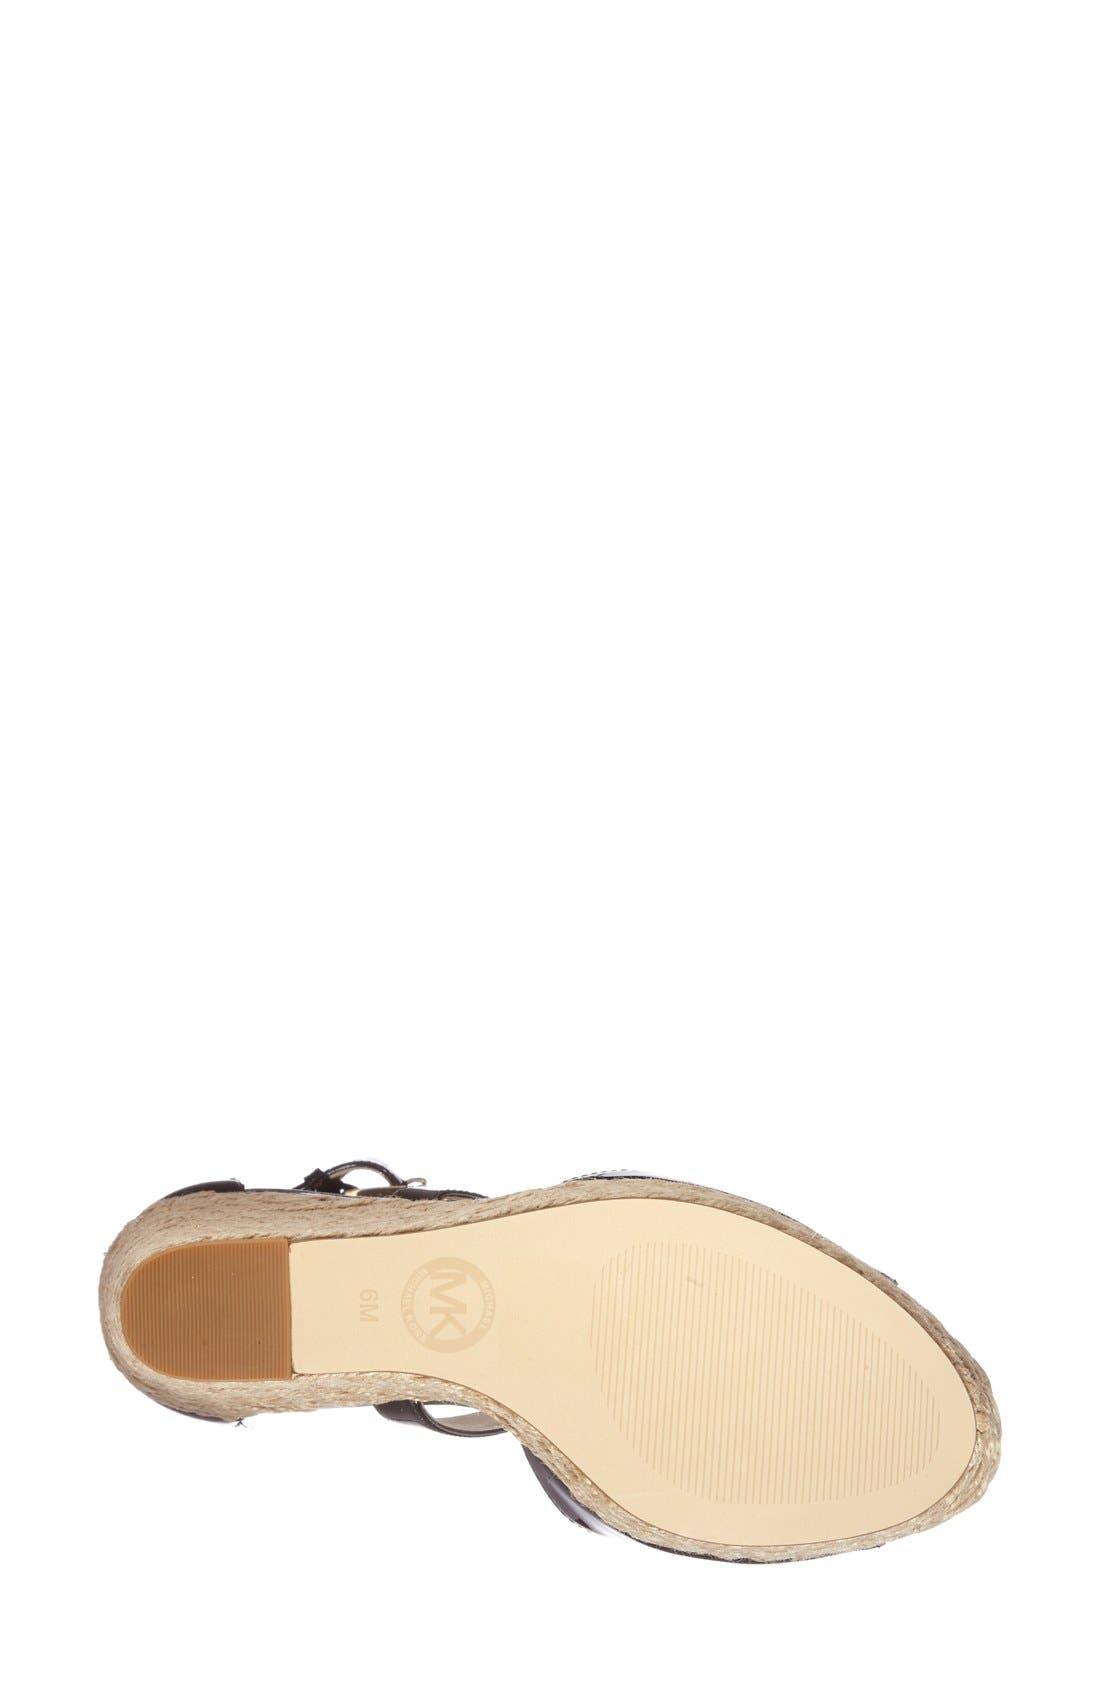 'Gabriella' Espadrille Wedge Sandal,                             Alternate thumbnail 3, color,                             001